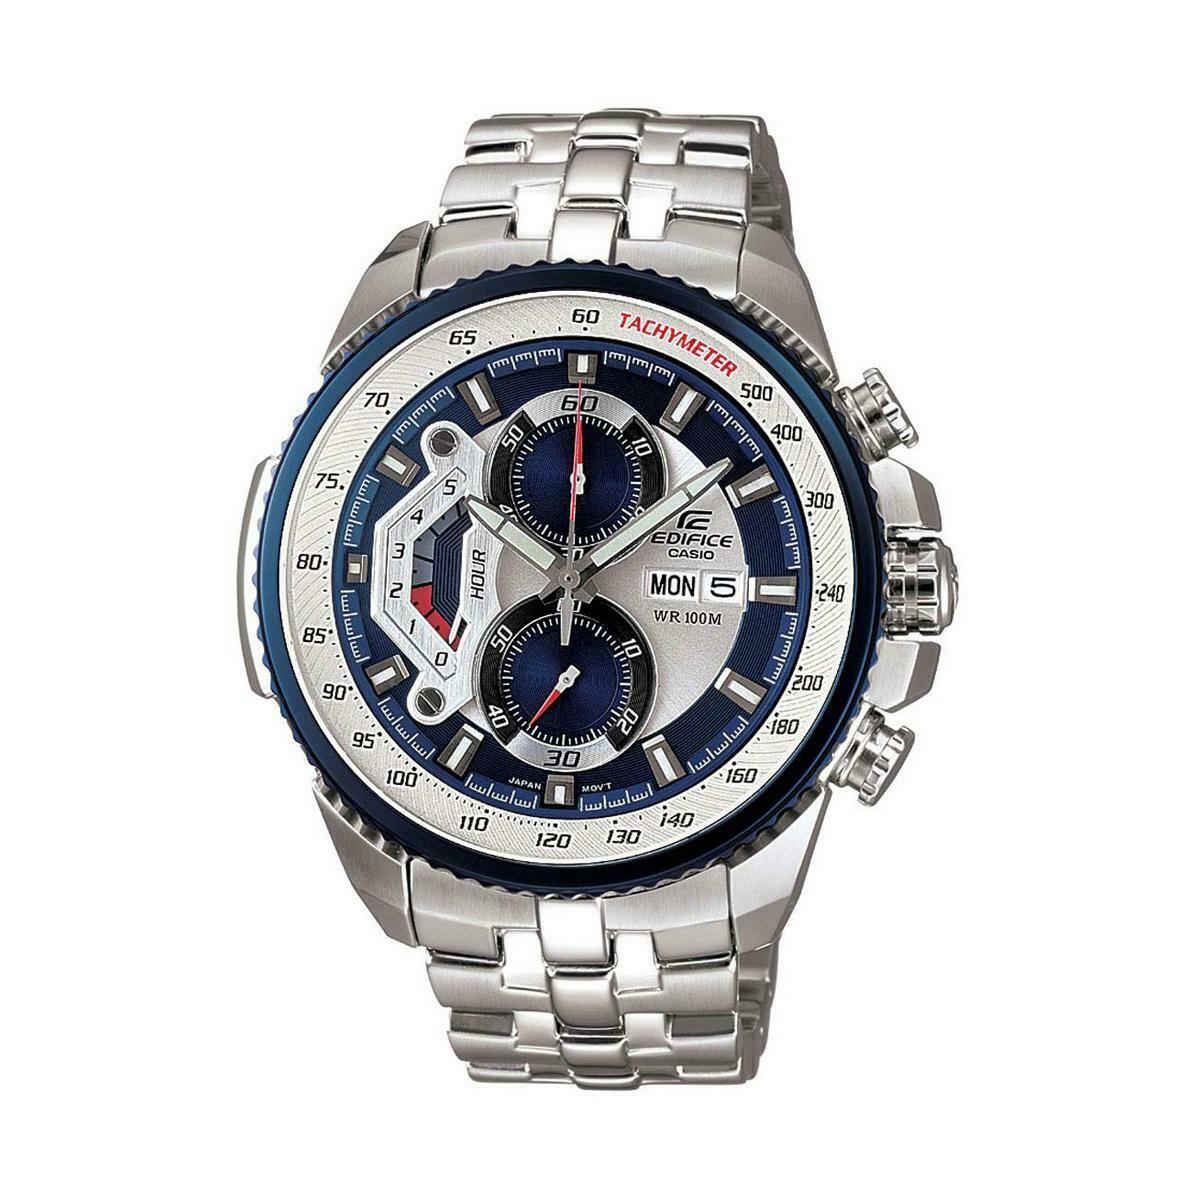 Casio Edifice EF-558D-2AVDF Analog Wrist Watch For Men - Silver